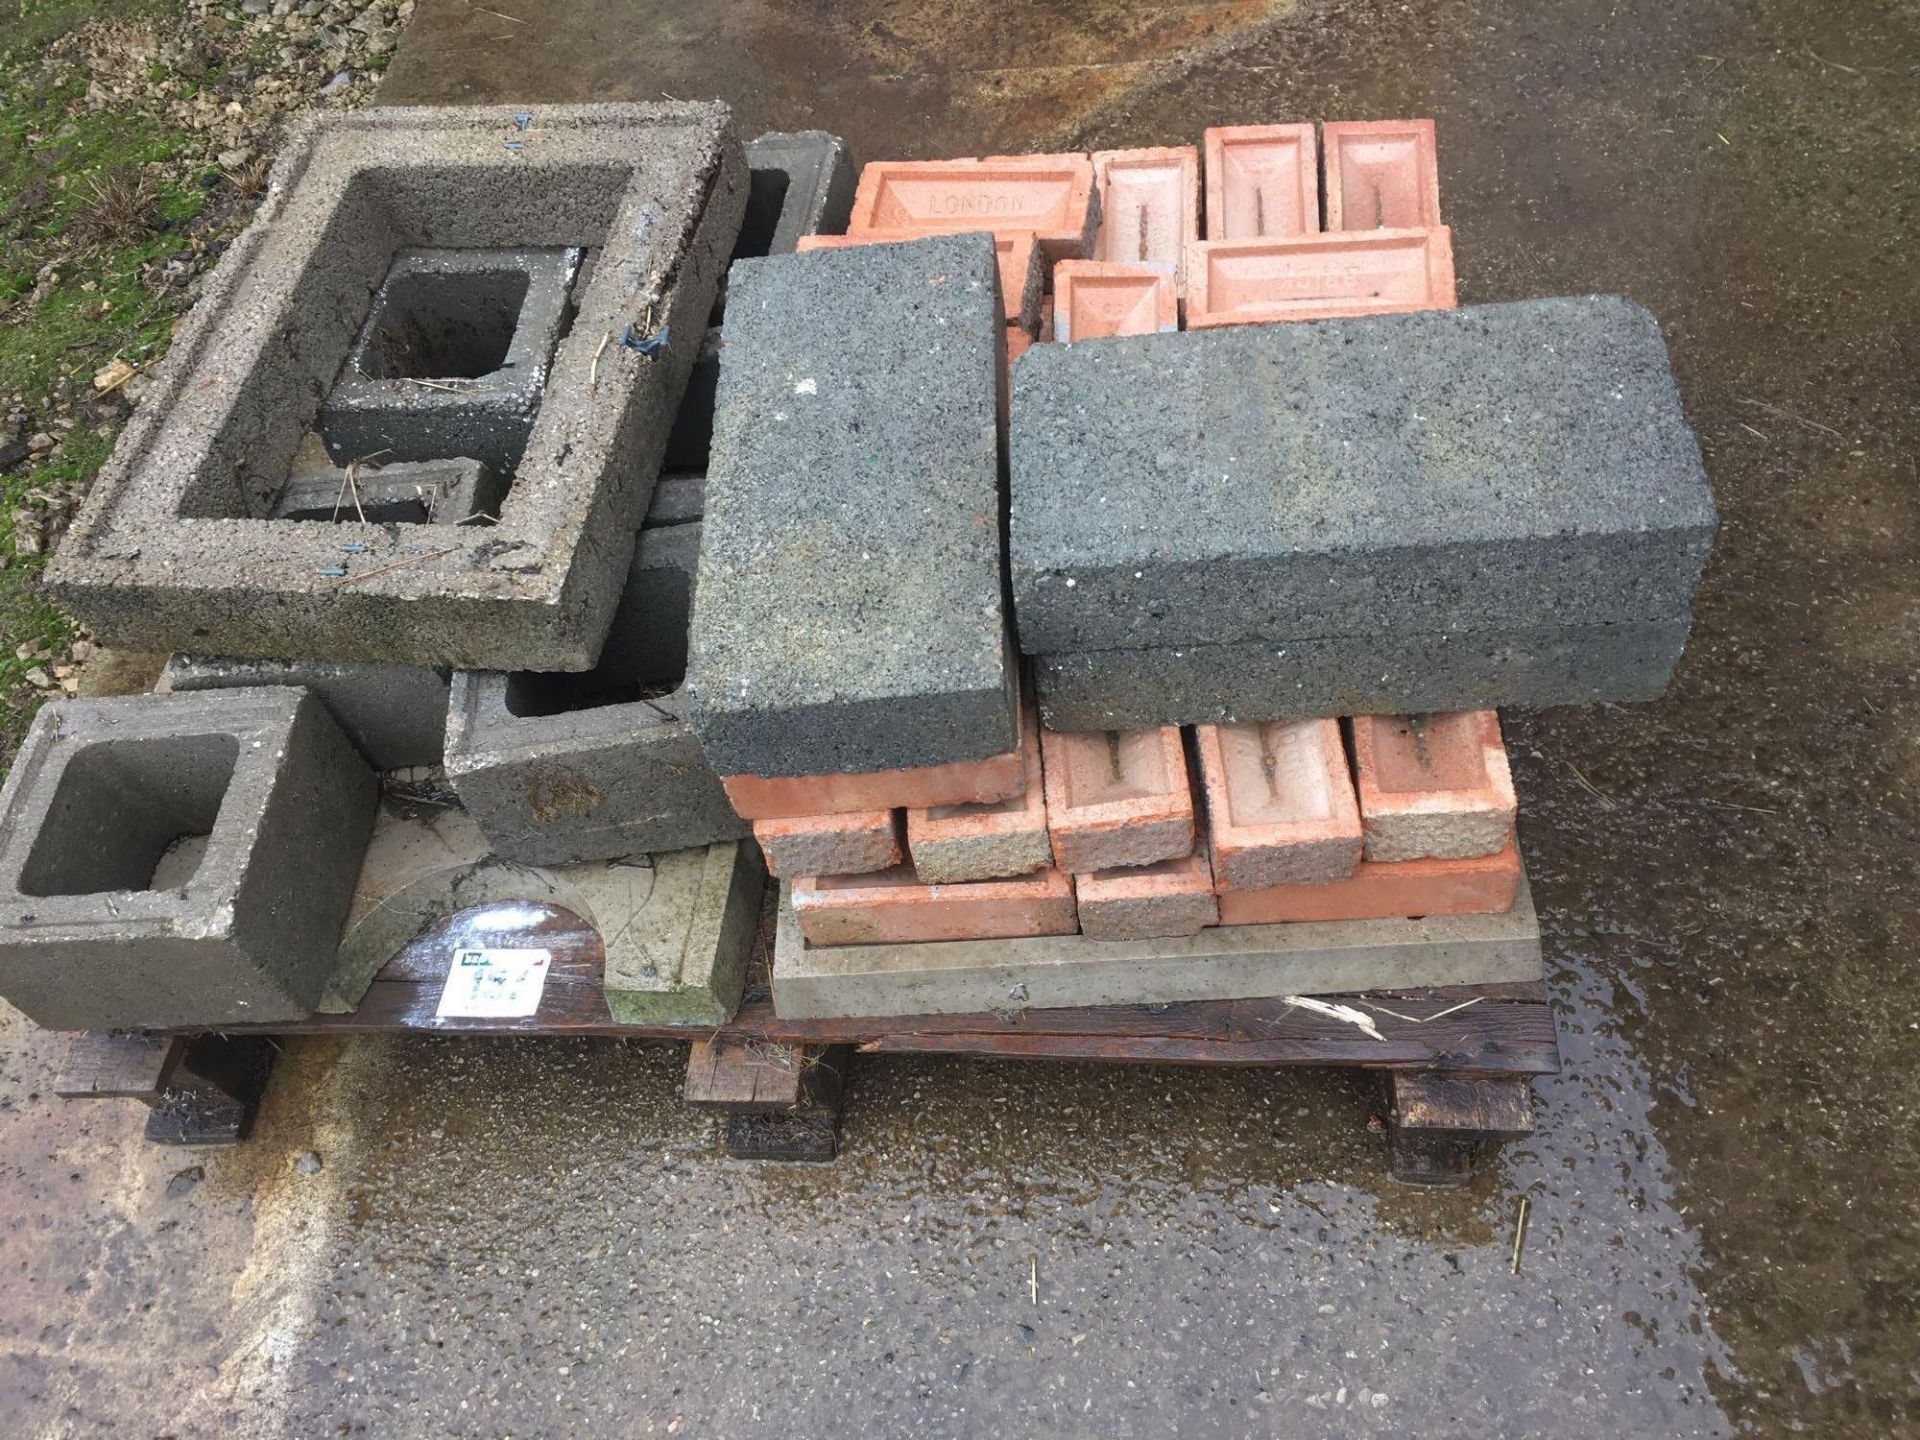 Quantity of building material